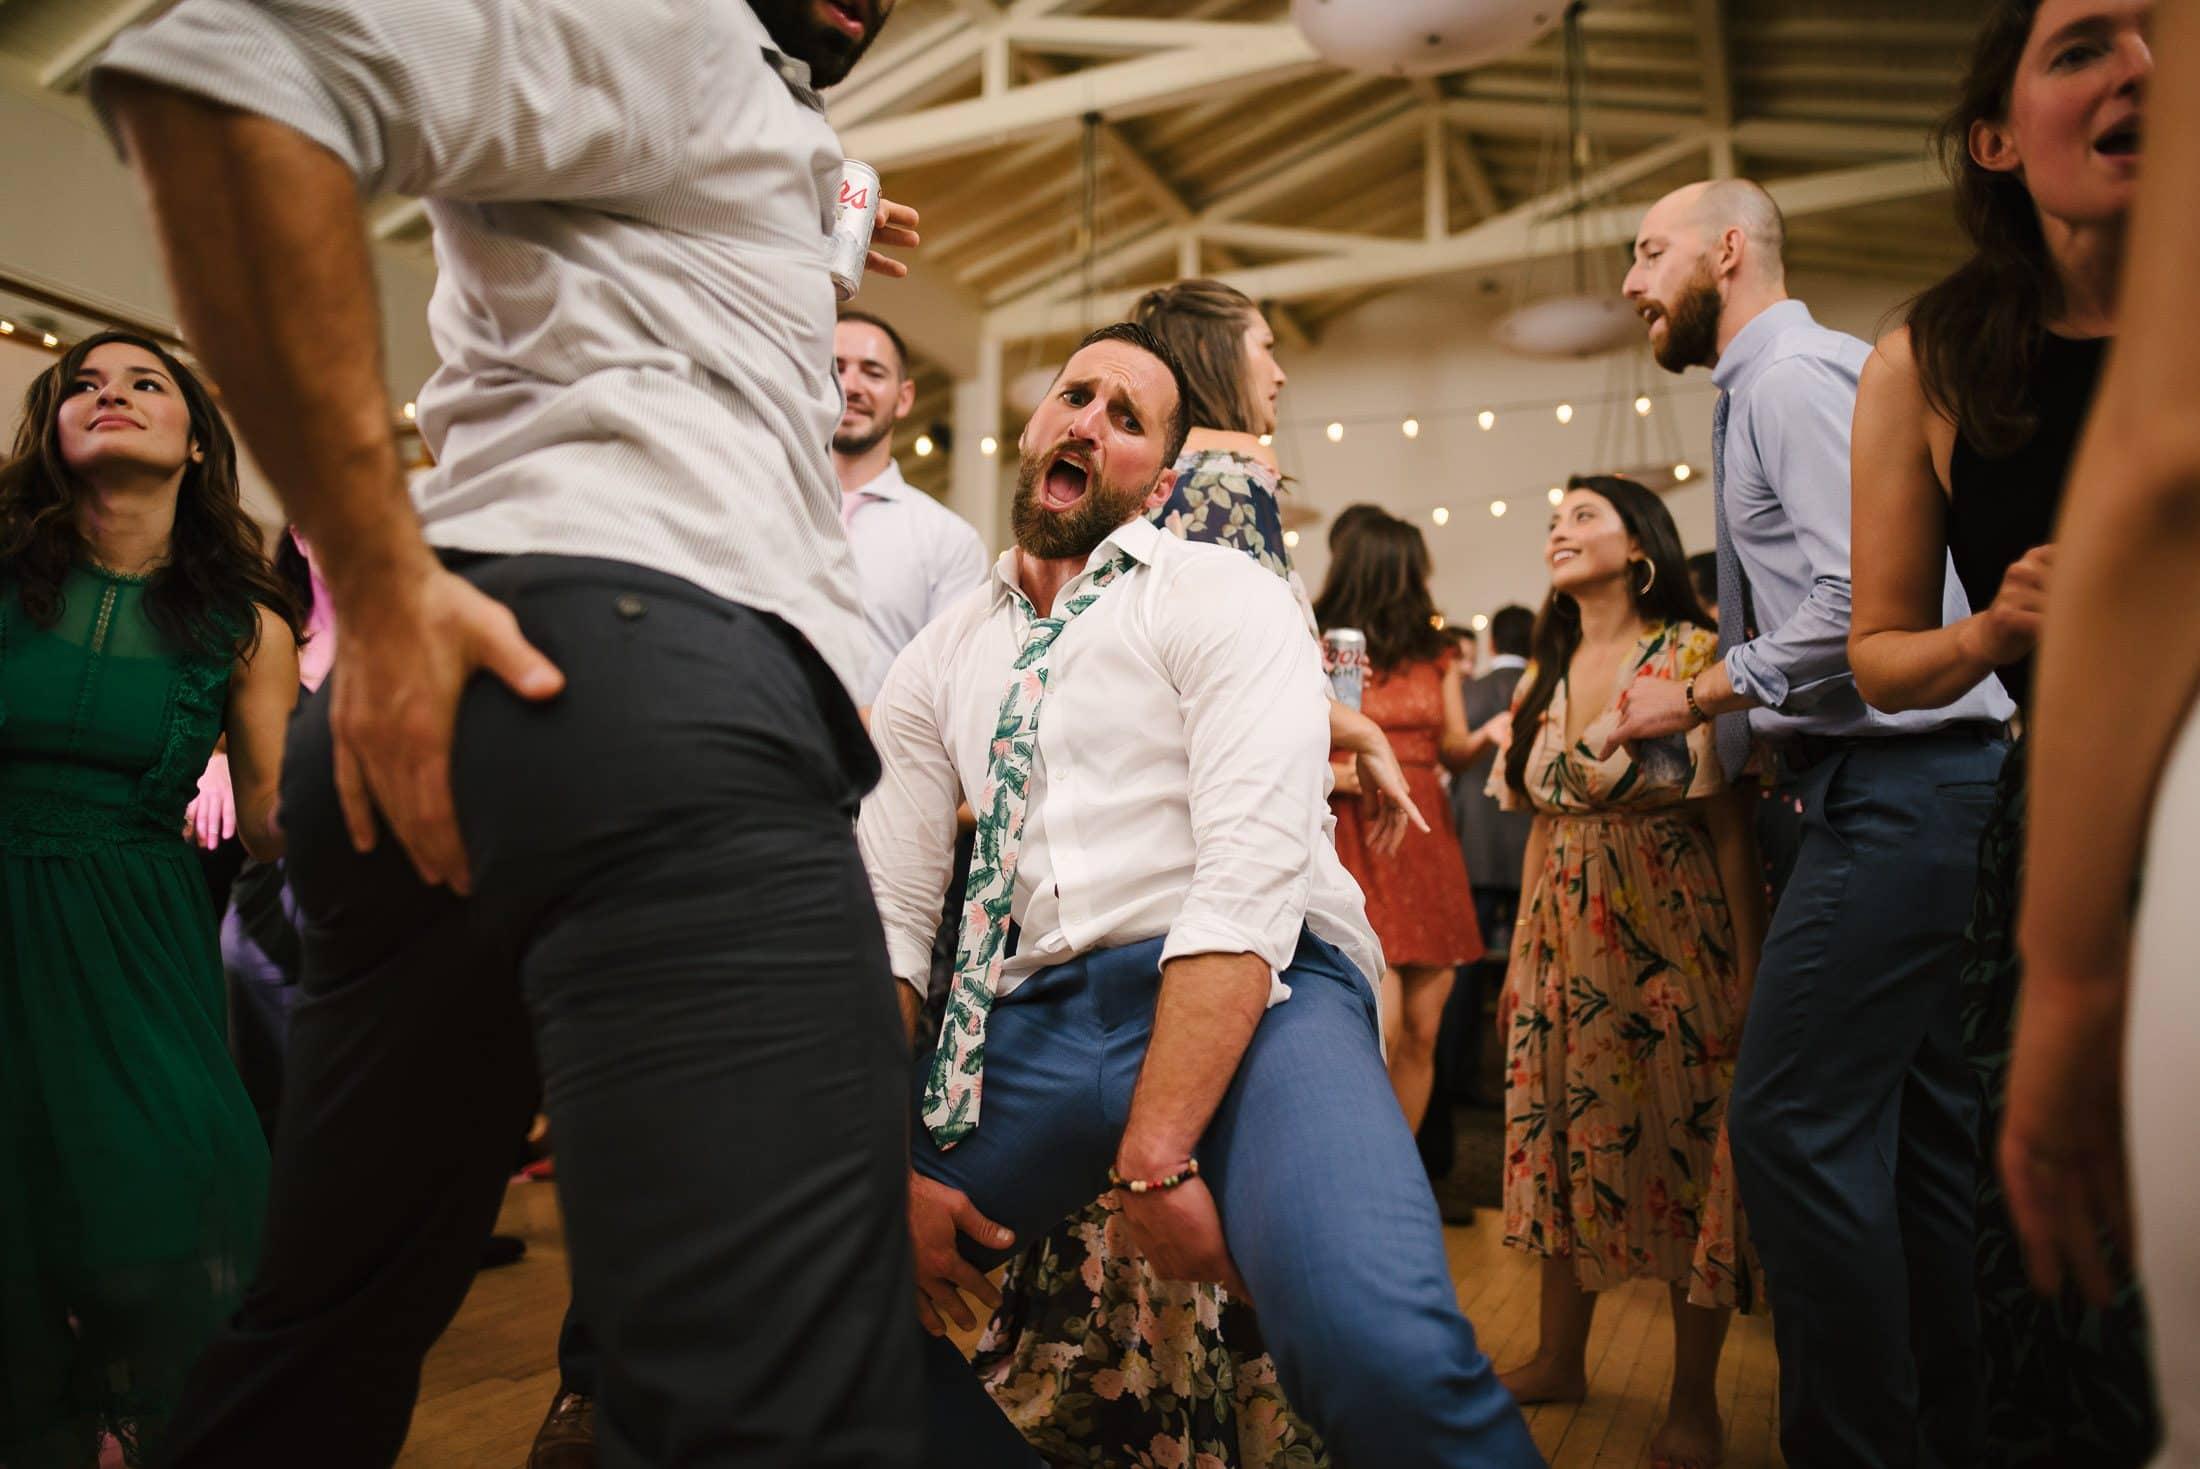 Golden Gate Club Wedding Party